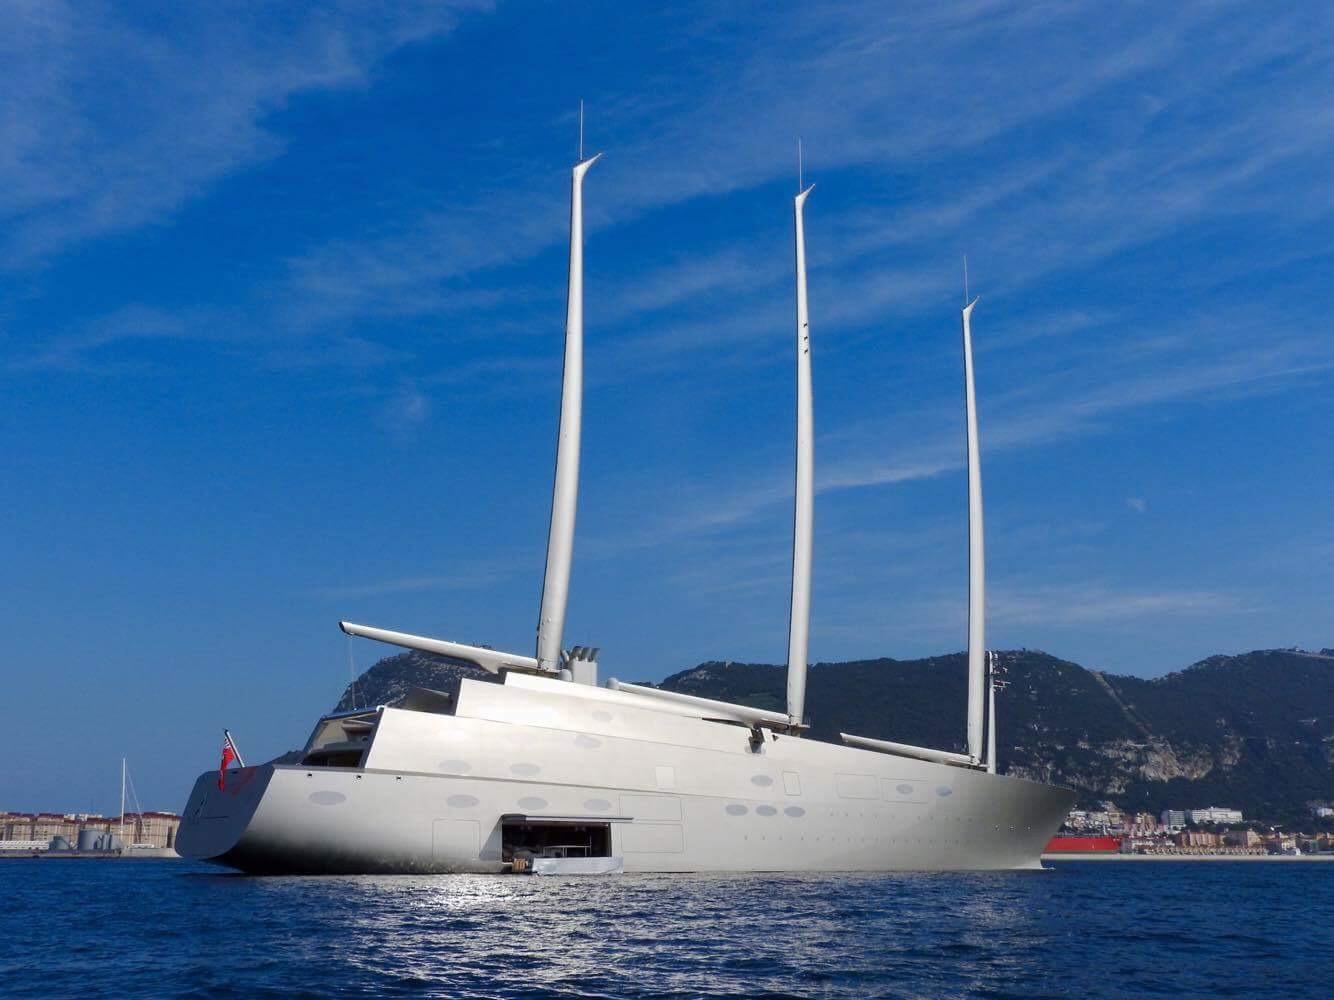 Yacht Sailing Yacht A Nobiskrug Charterworld Luxury Superyacht